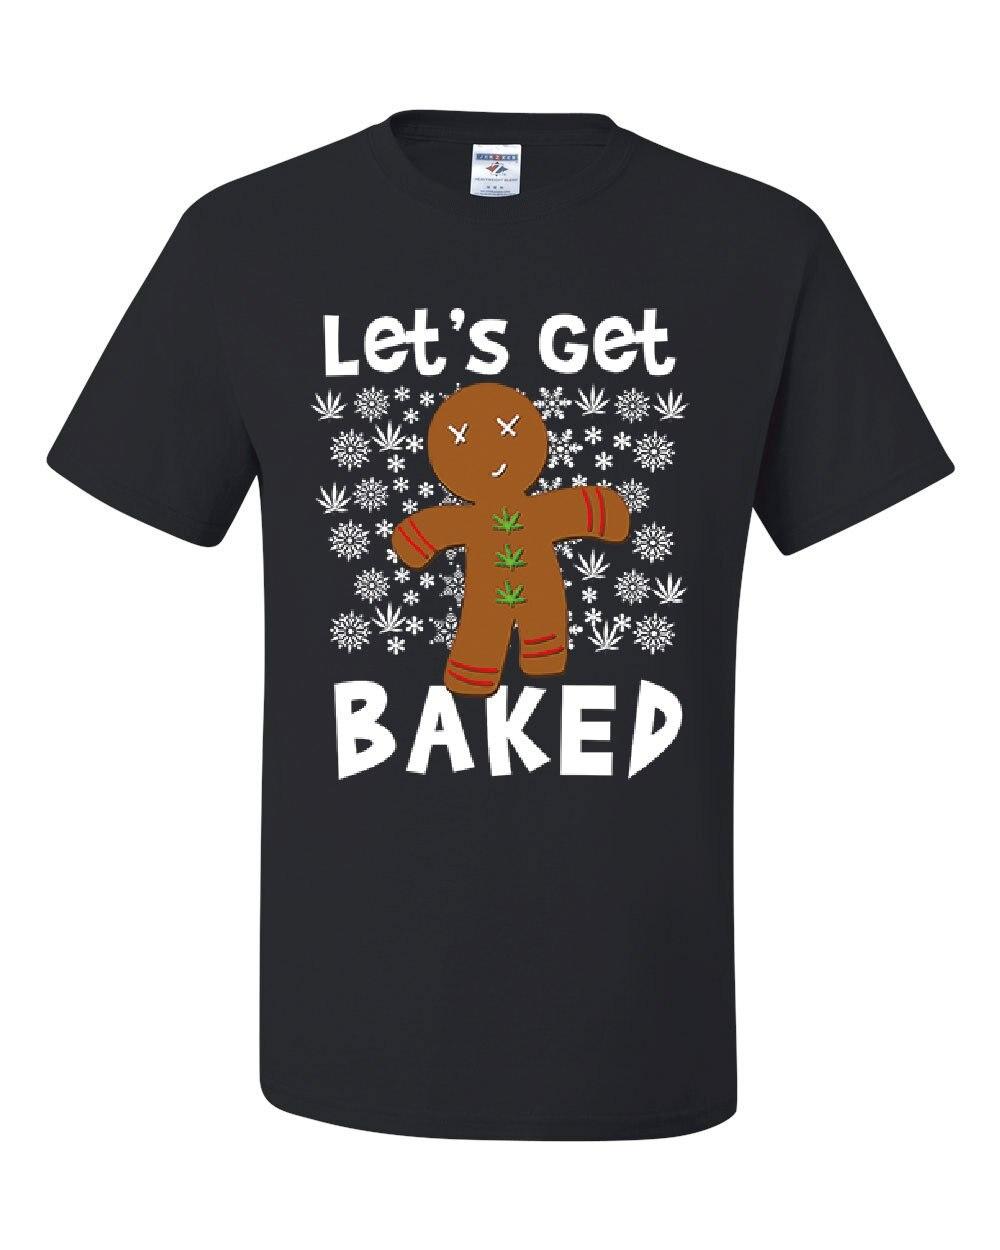 Let's Get Baked T-Shirt 420 Christmas Ugly Sweatshirt Weed Xmas Tee Shirt   Cool Casual pride t shirt men Unisex Fashion tshirt